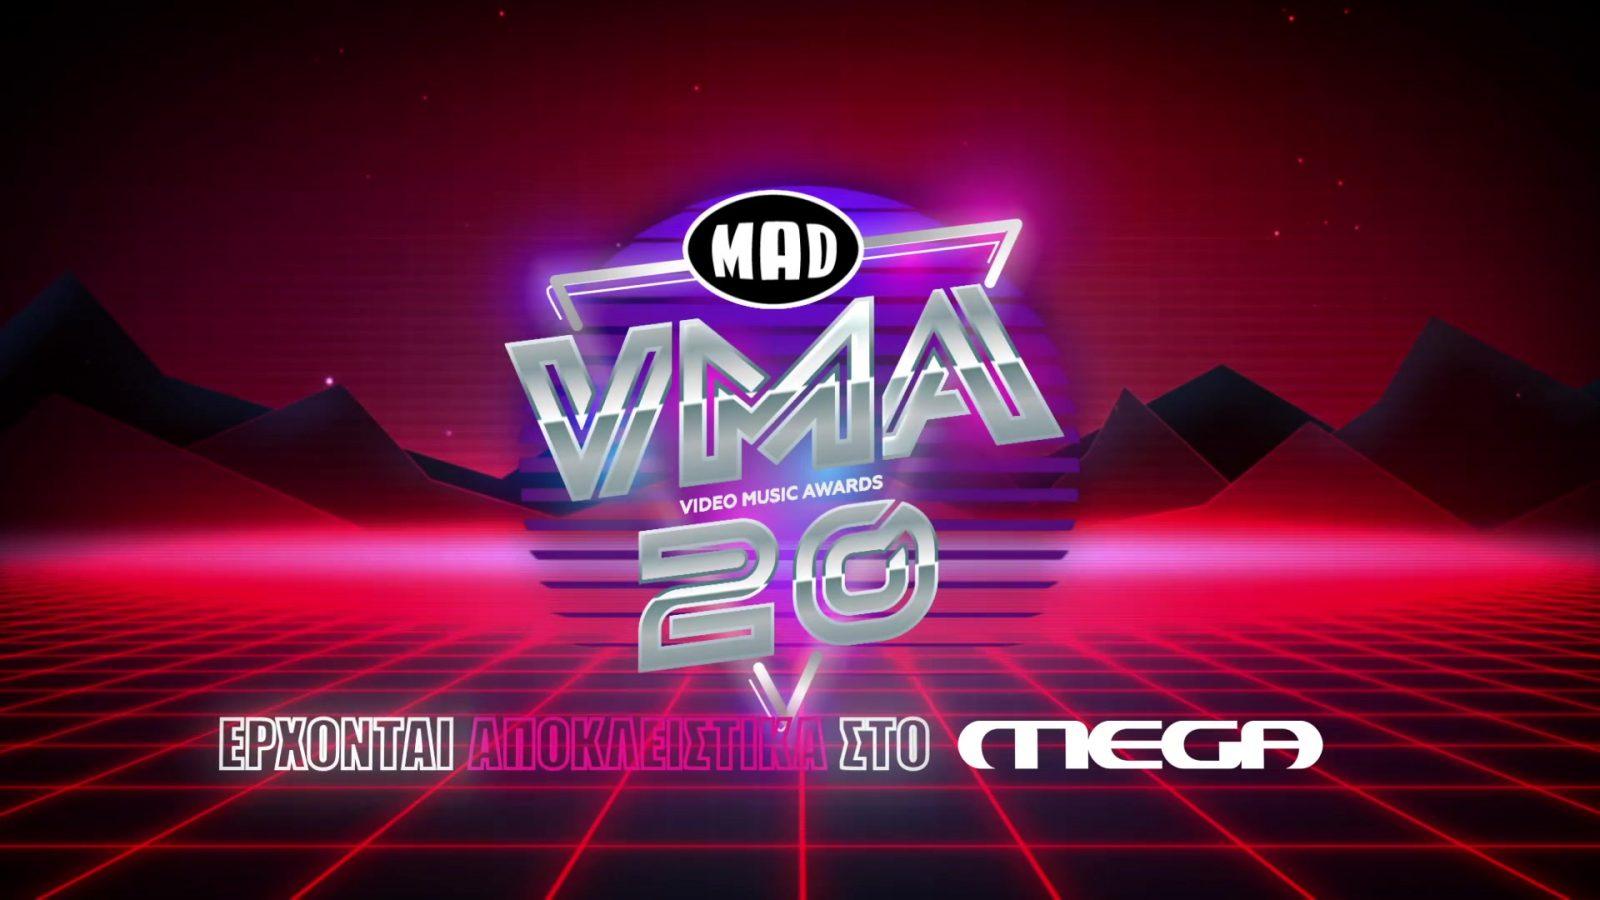 Tα «Mad Video Music Awards 2020» έρχονται τον Δεκέμβριο ...